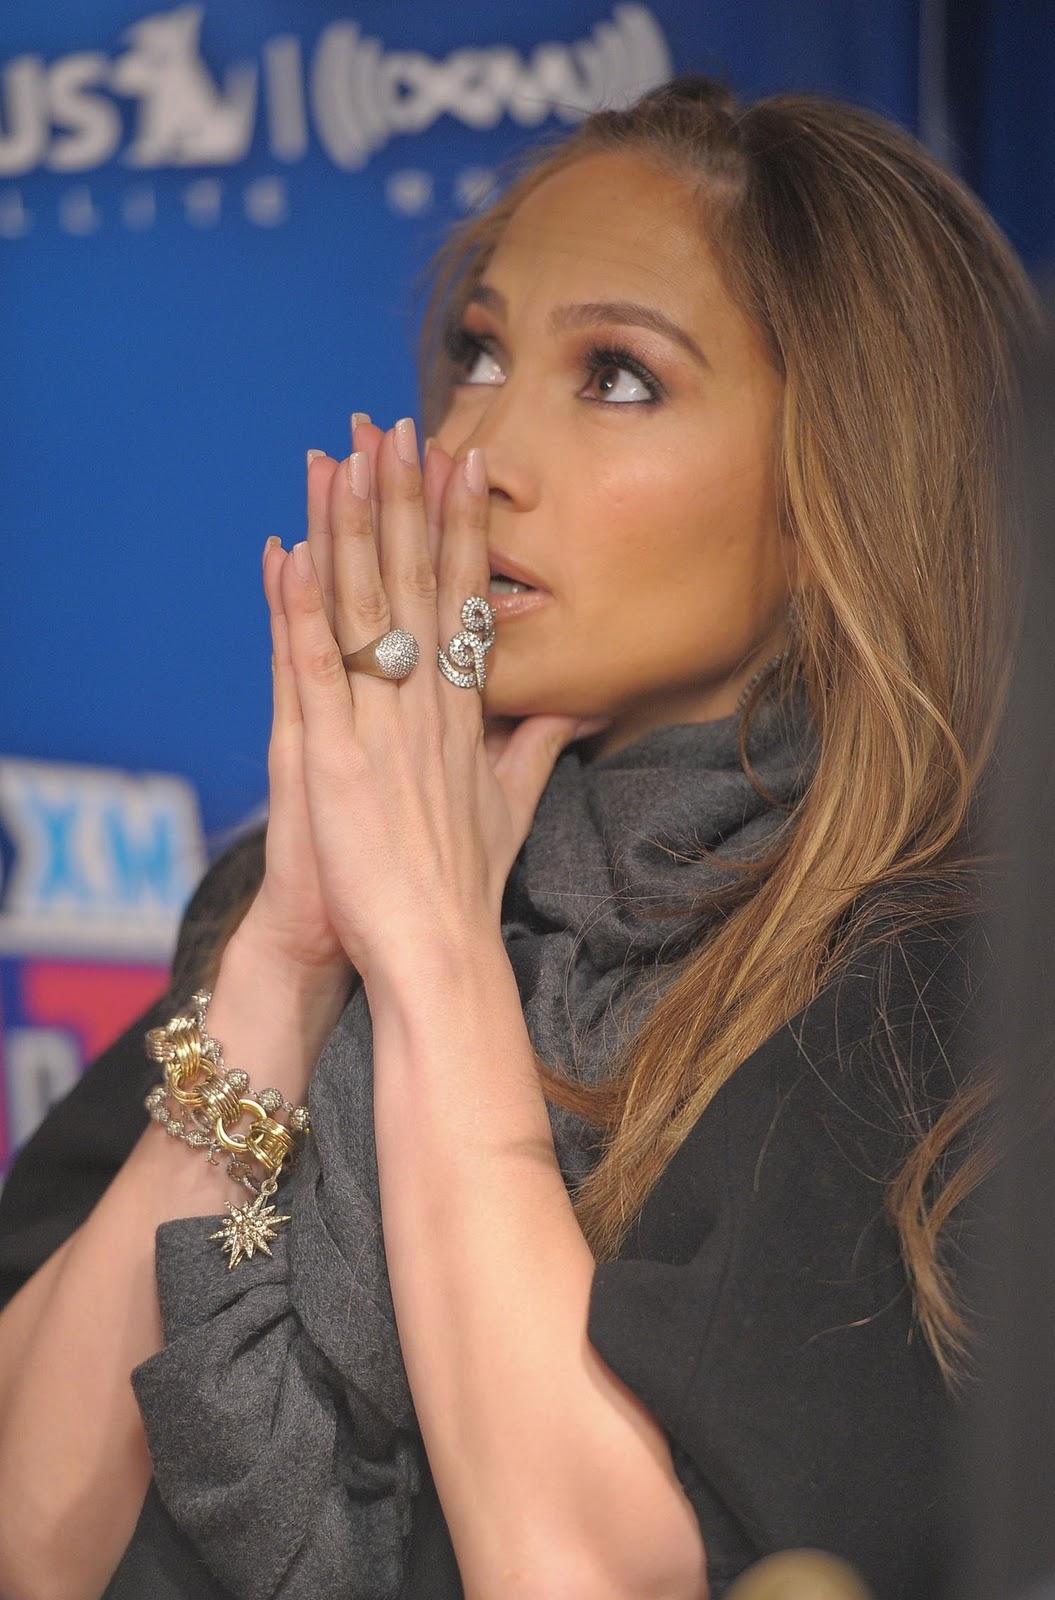 http://4.bp.blogspot.com/_NVrzrZehSts/TUsin_syibI/AAAAAAAACS0/zl_V5VRVtMA/s1600/Jennifer+Lopez+in+H.Stern+for+Sirius+XM+.jpg